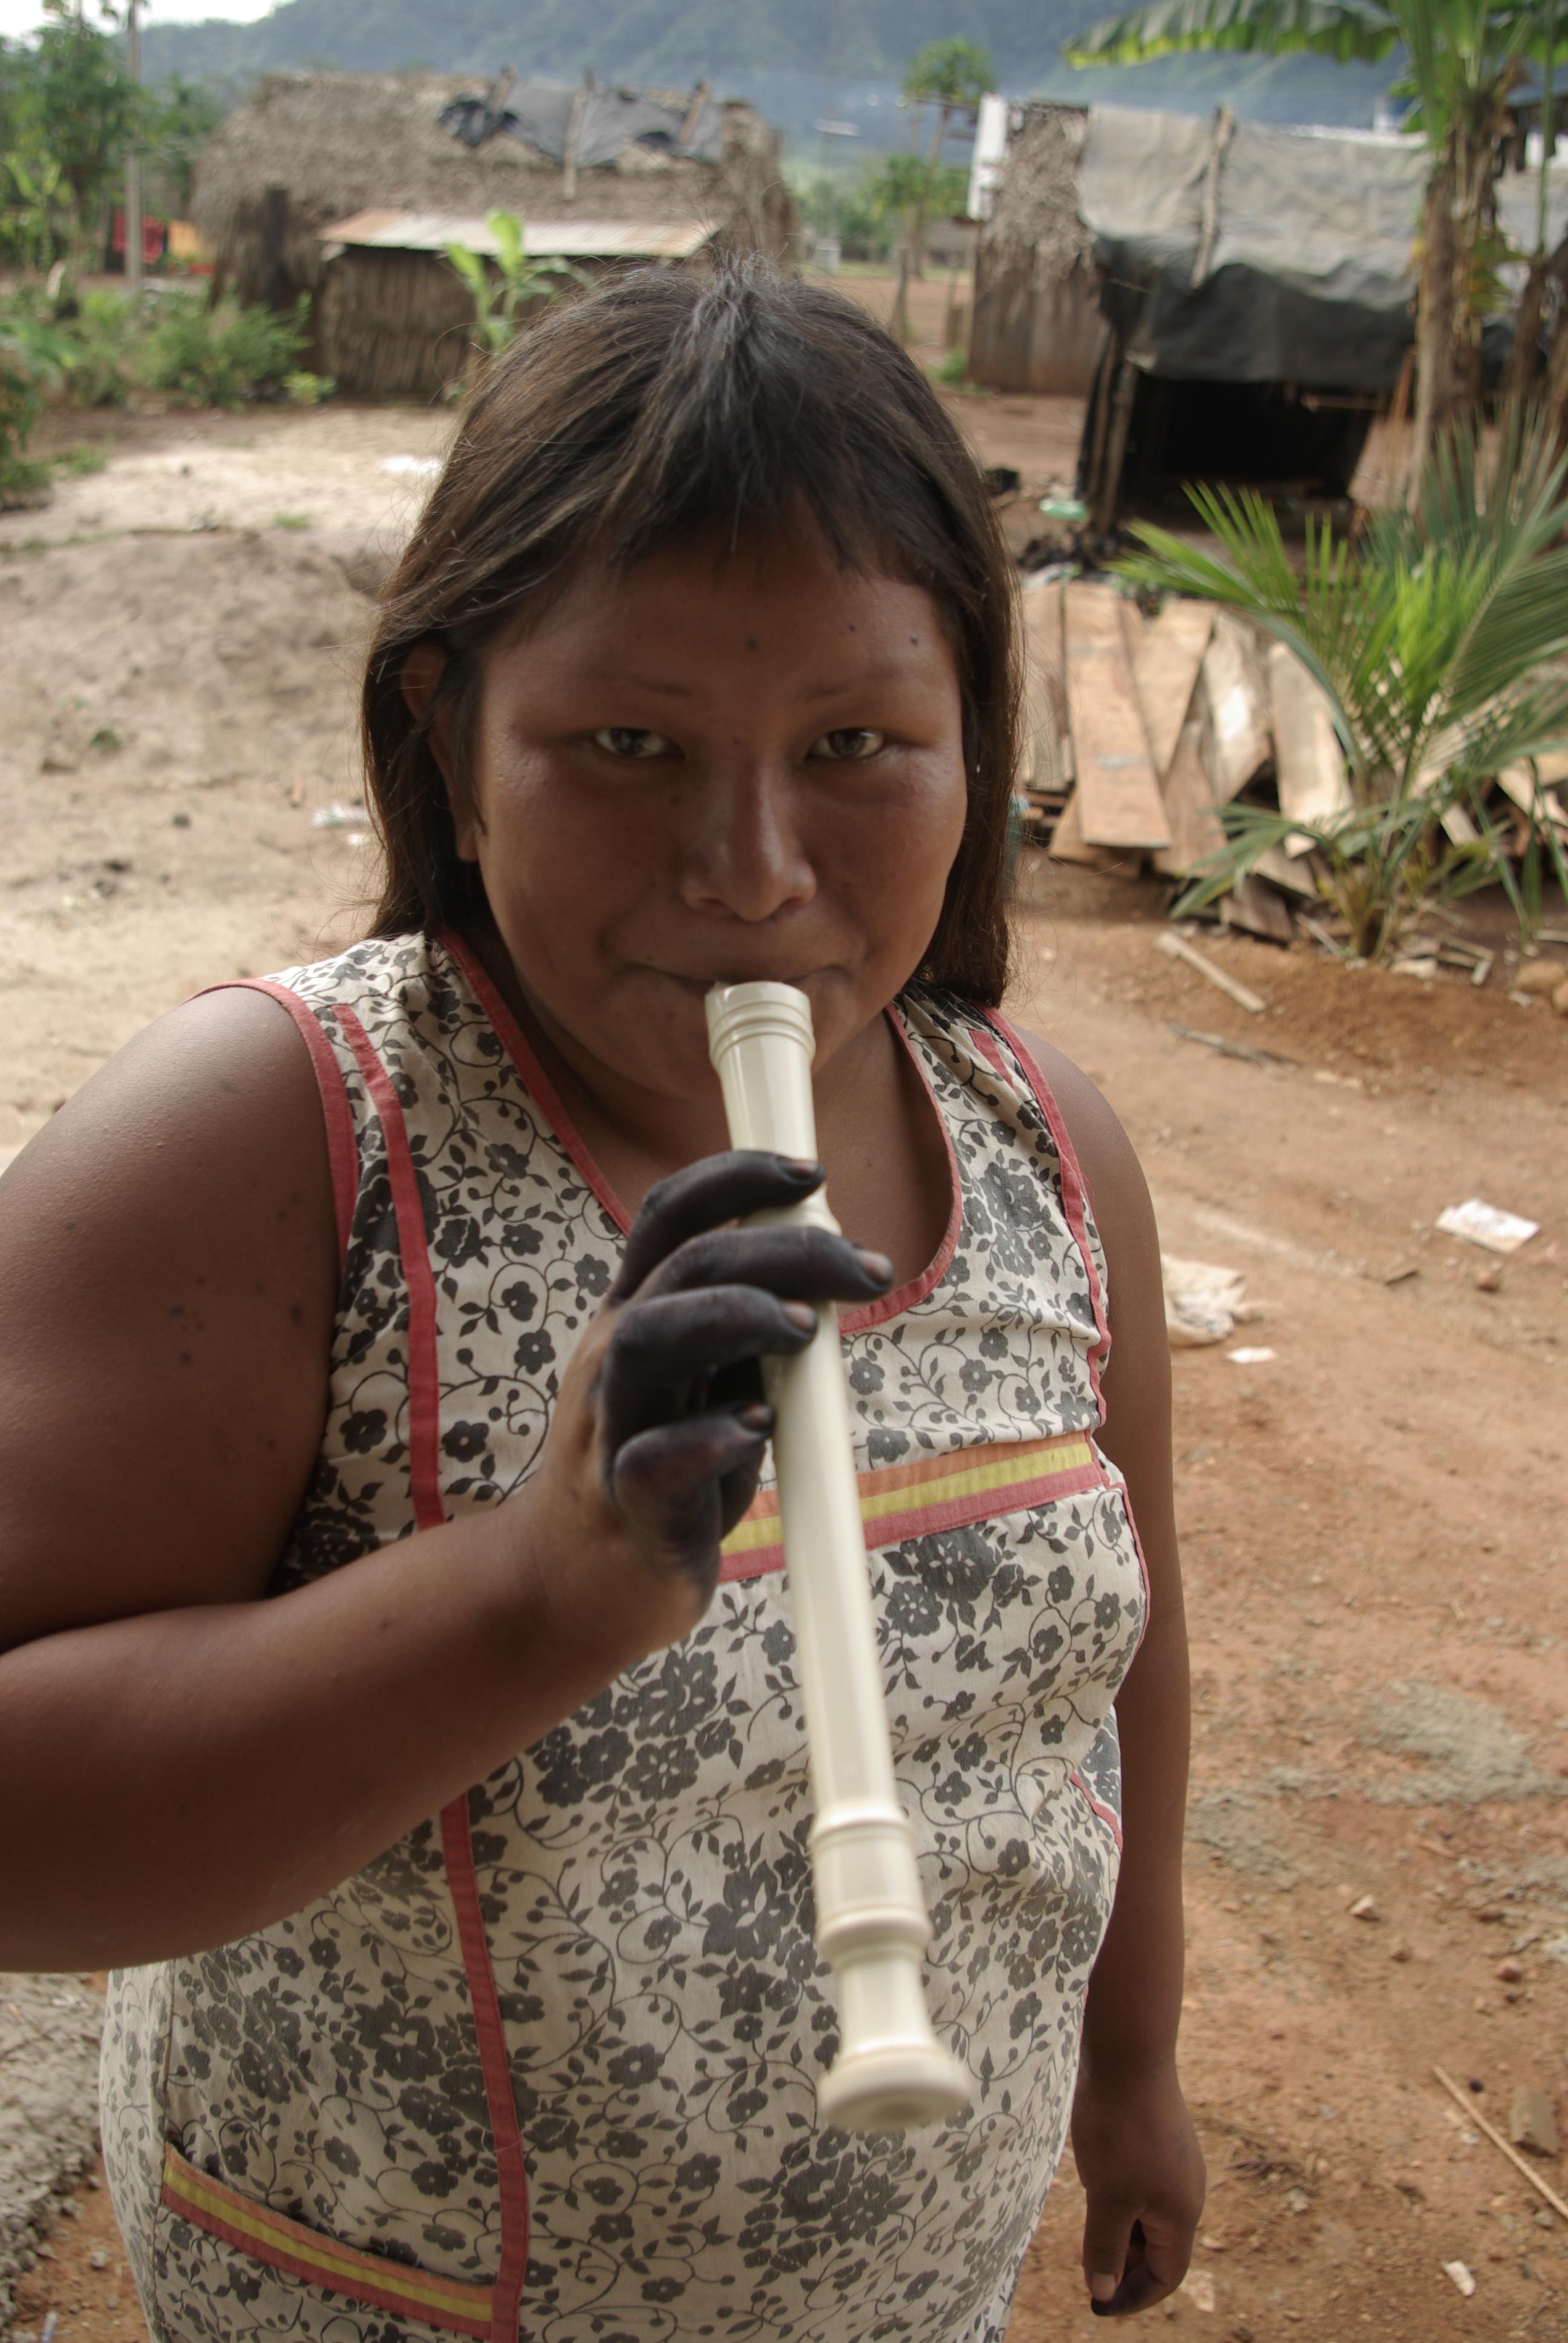 AMAZON ART